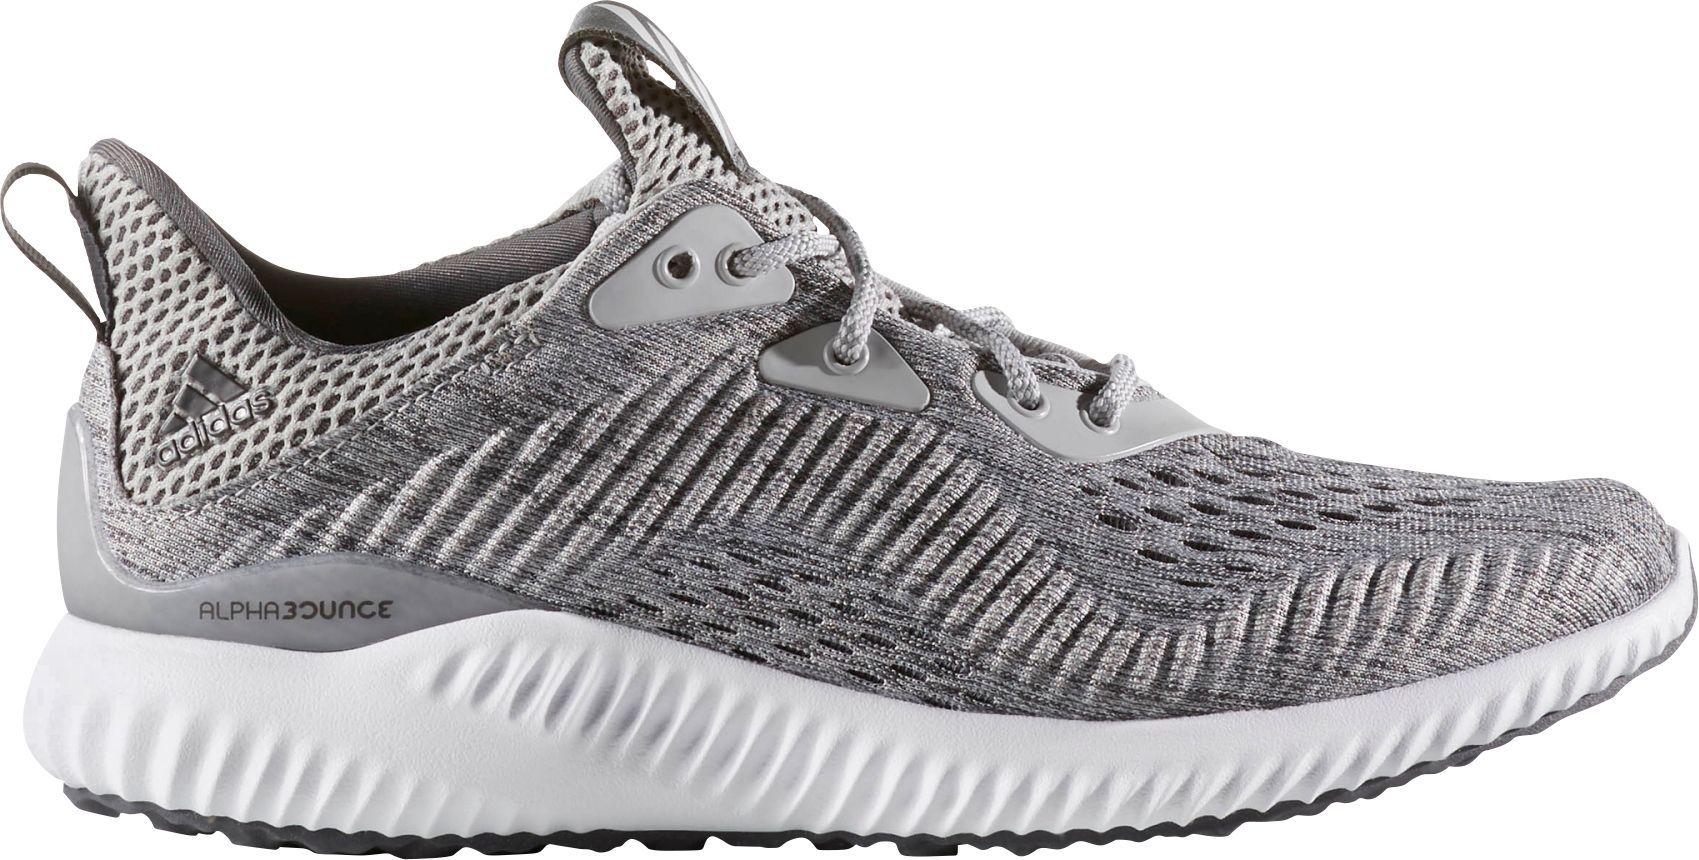 a7c692e1af10 adidas Women s alphabounce EM Running Shoes